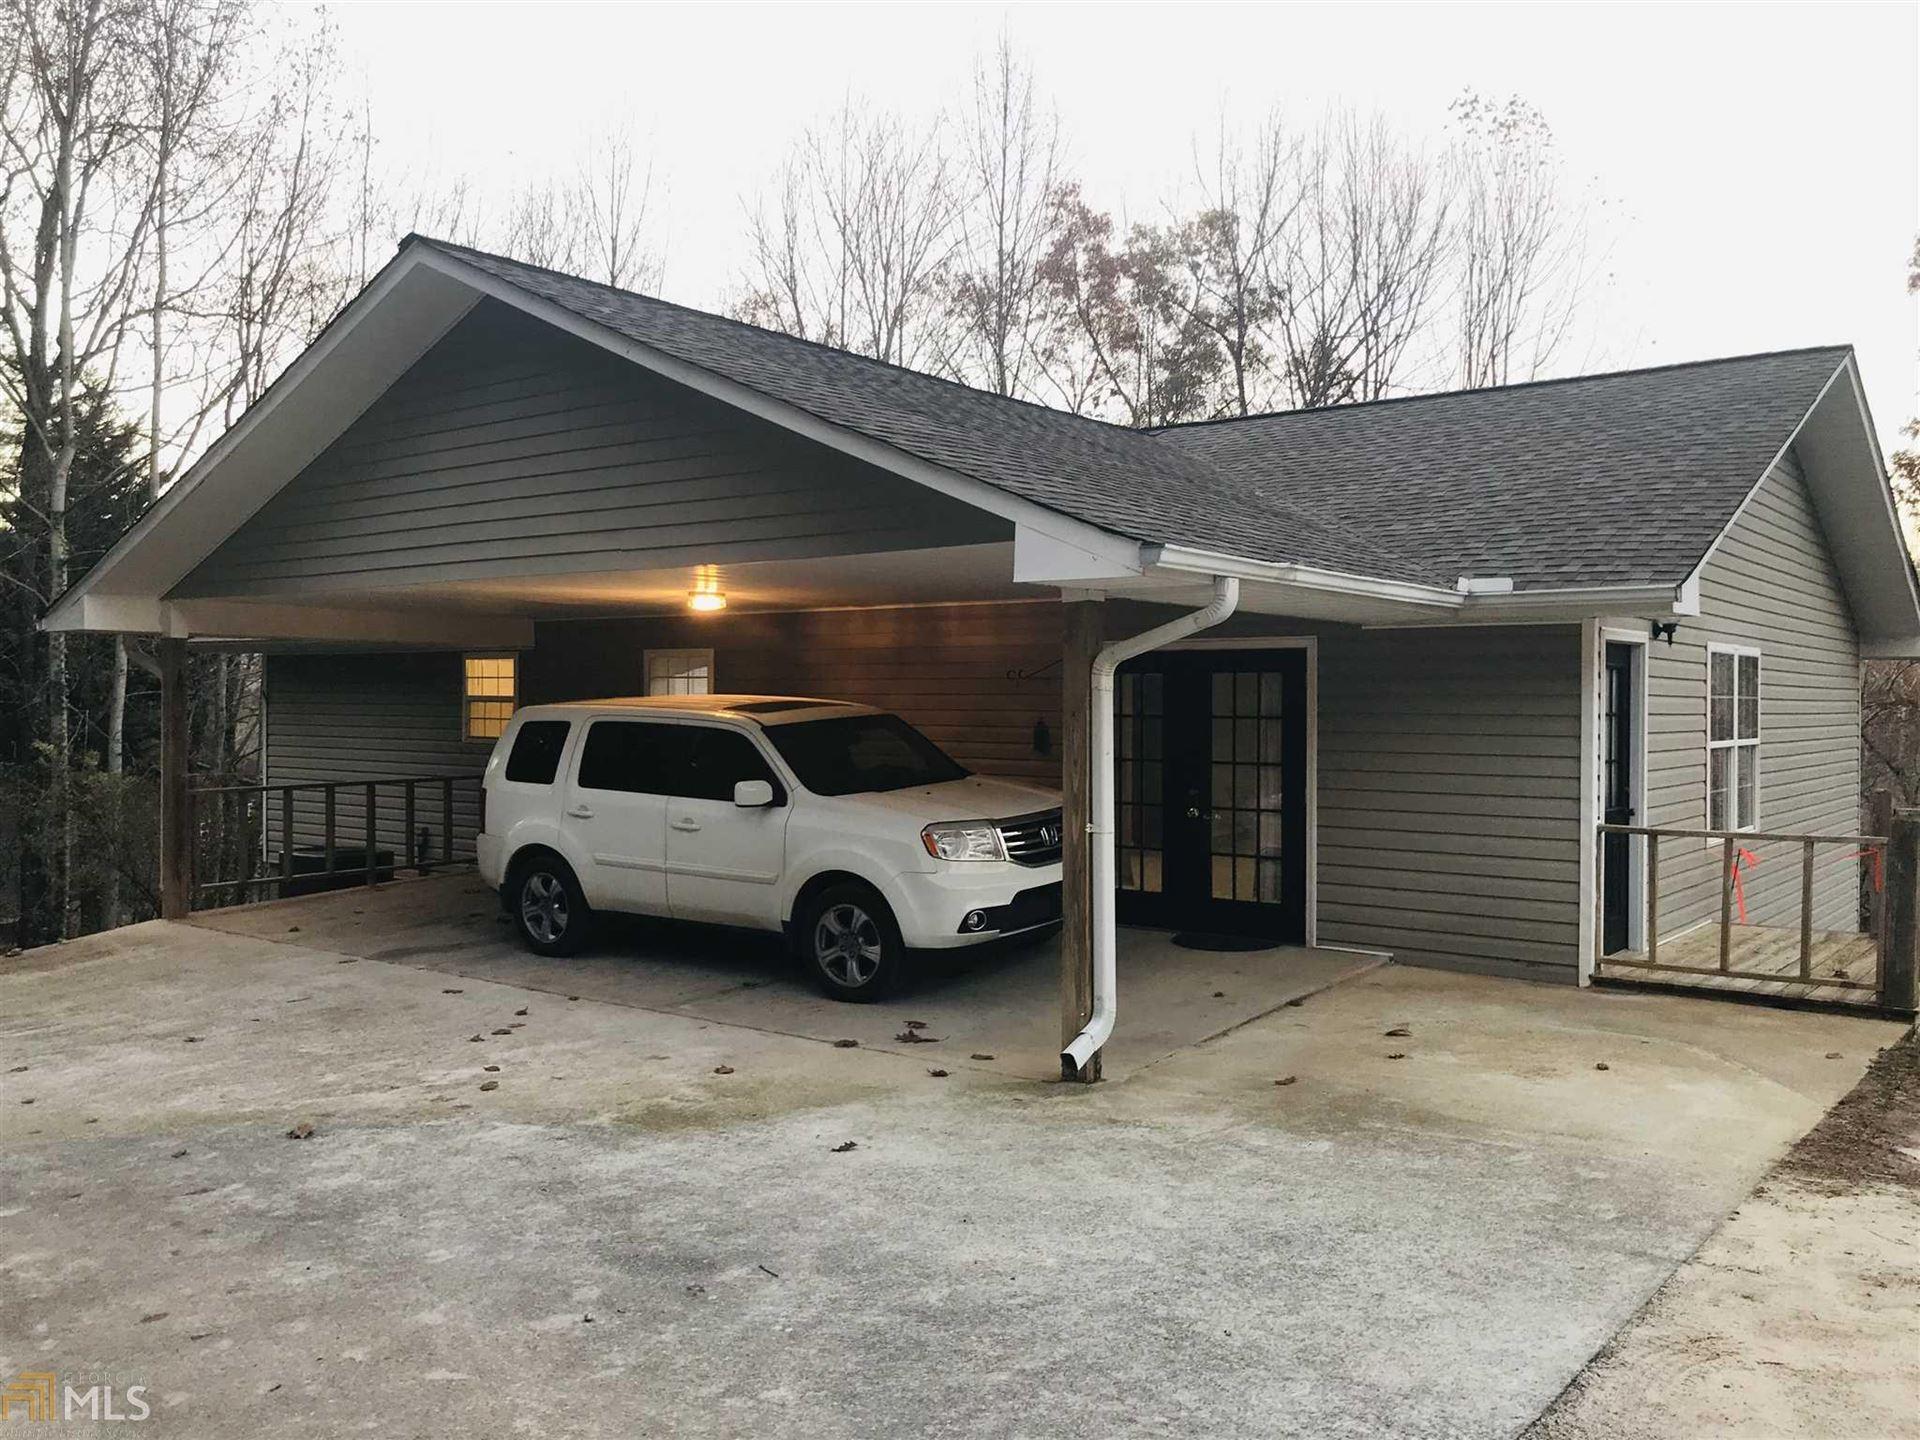 122 Hemlock Ln, Clayton, GA 30525 - MLS#: 8884184